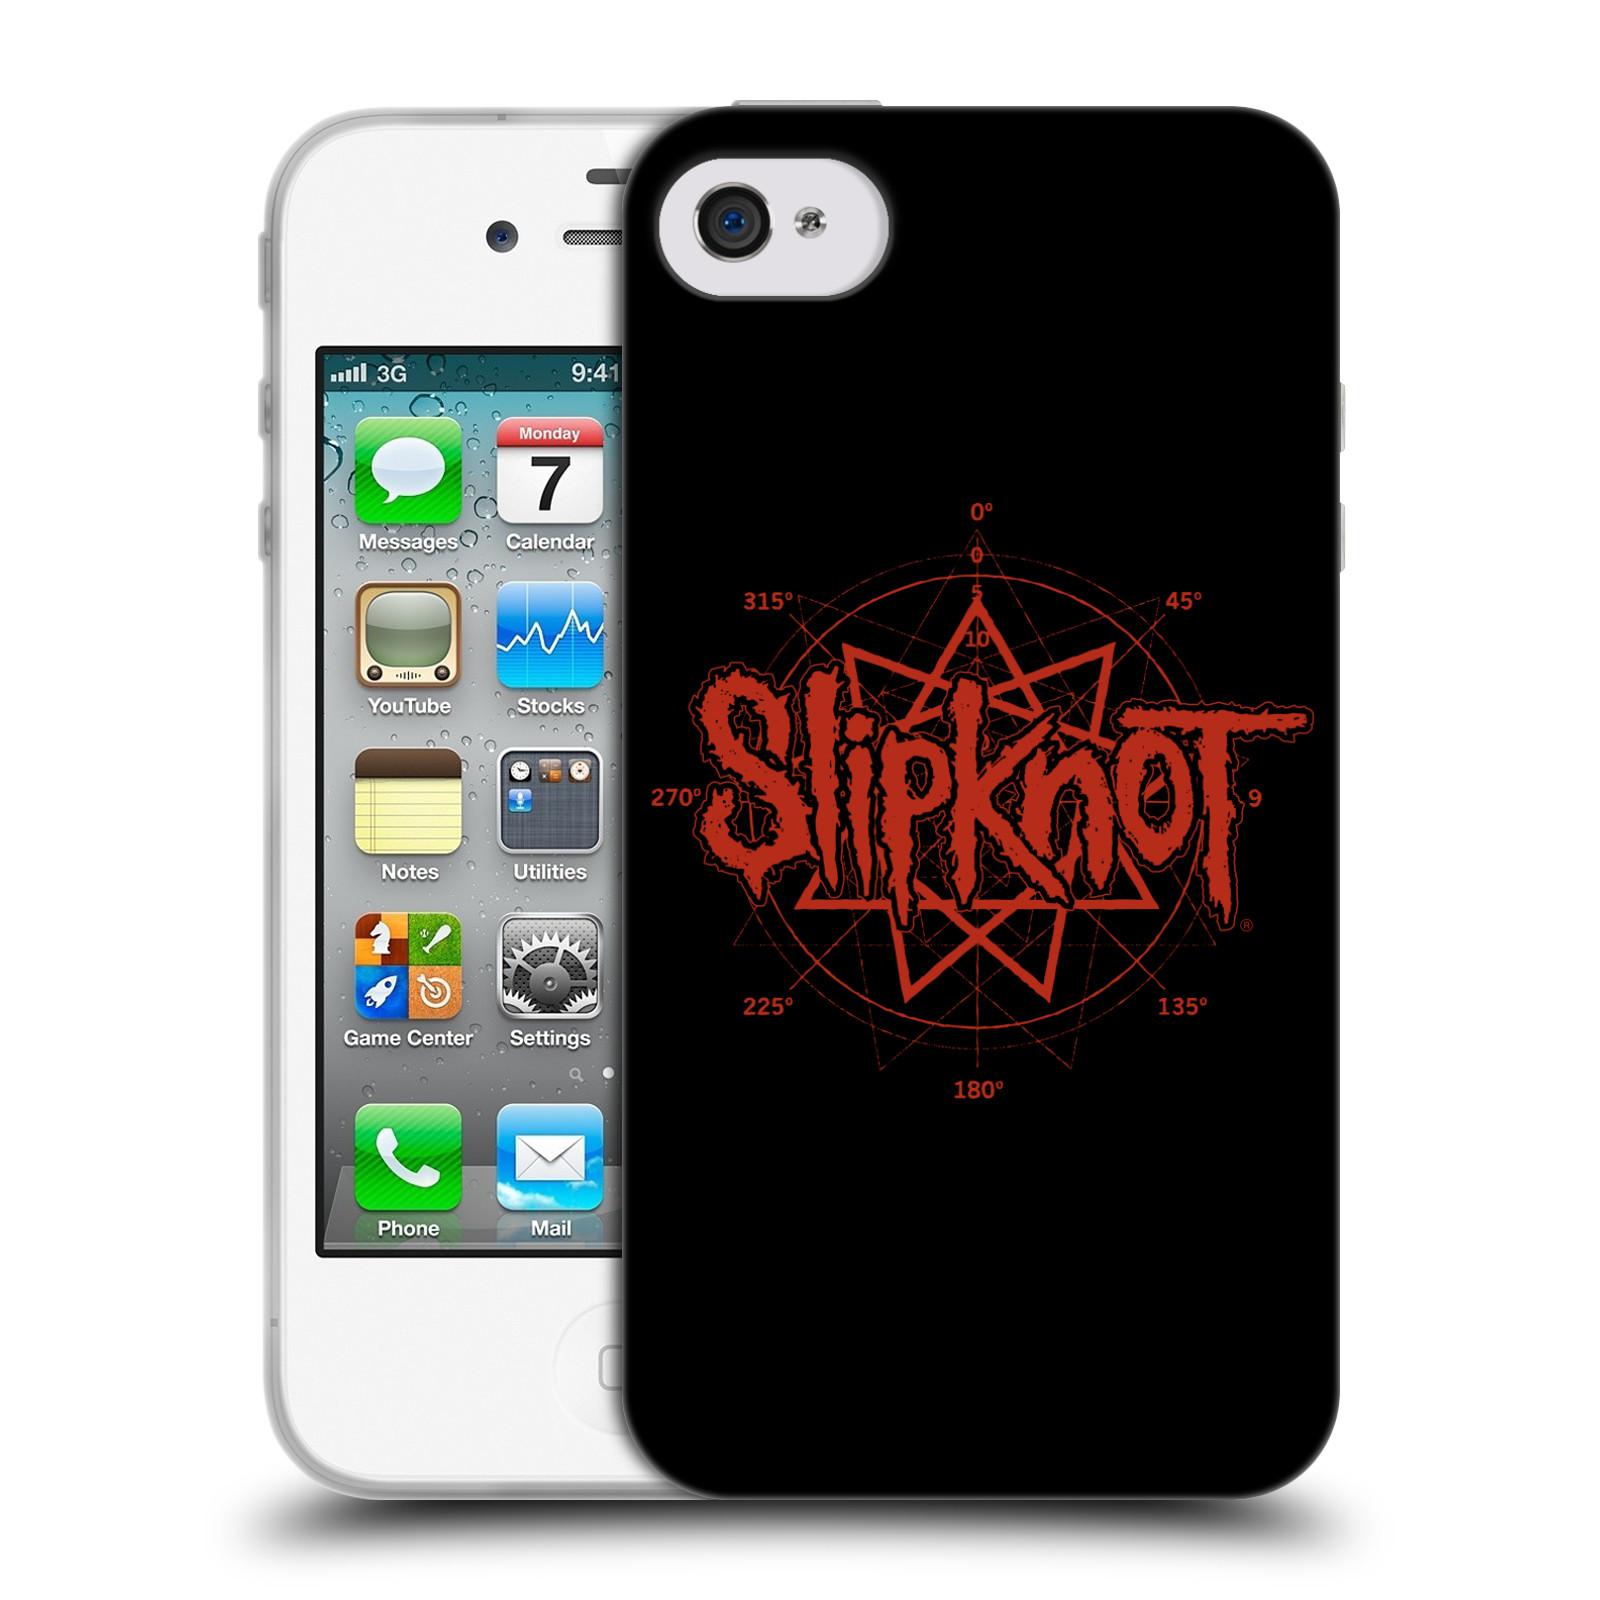 HEAD CASE silikonový obal na mobil Apple Iphone 4/4S hudební skupina Slipknot logo